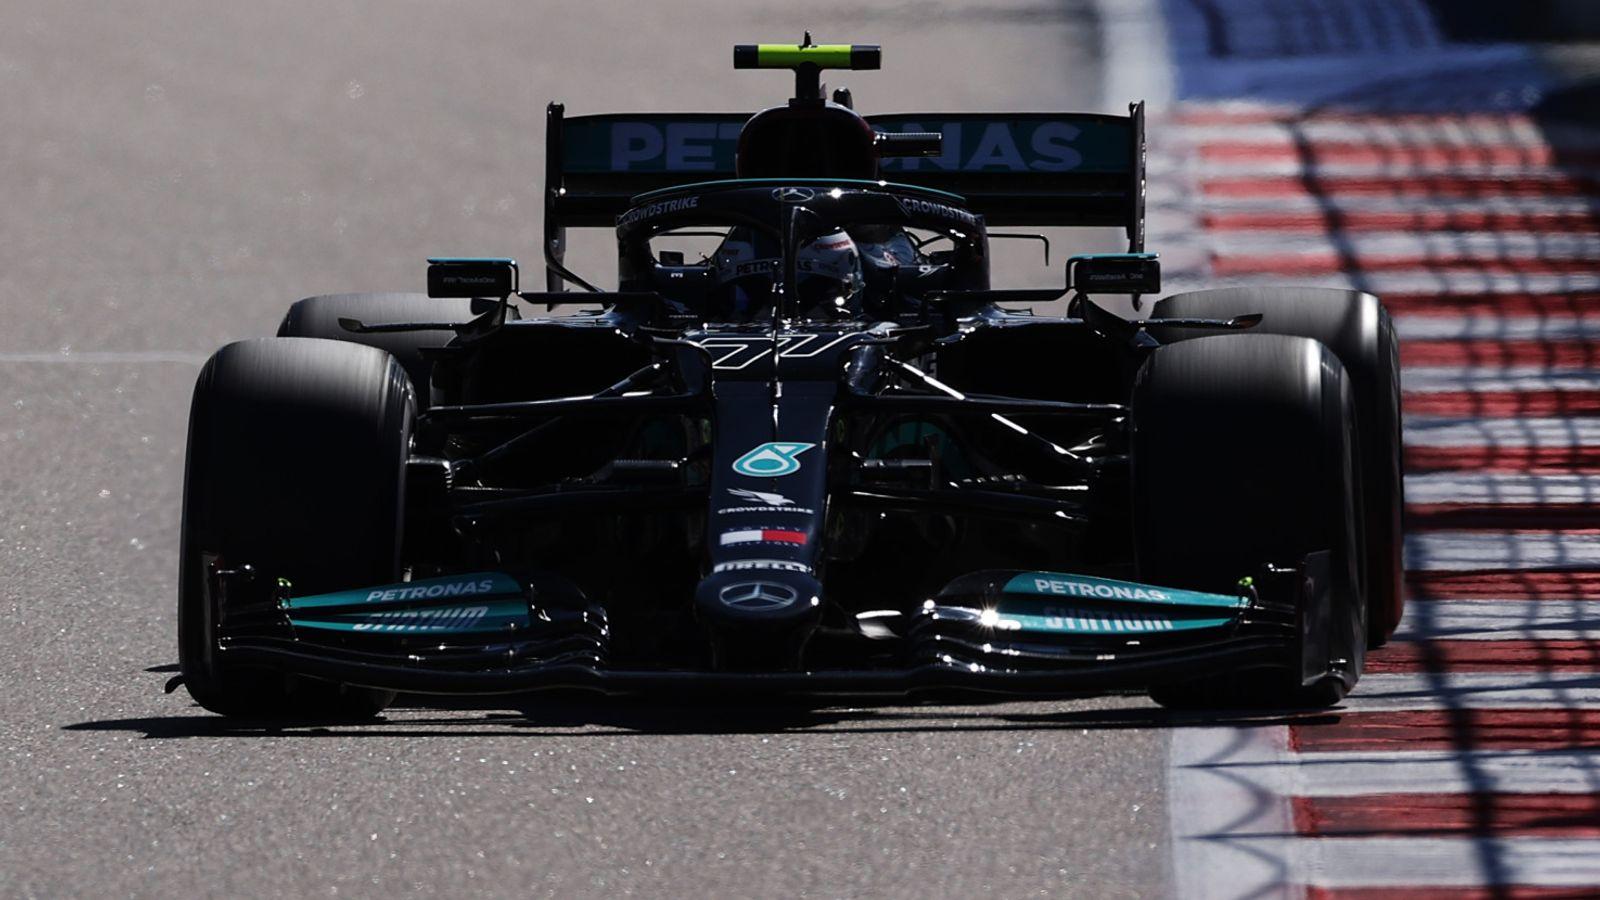 Russian GP, Practice One: Valtteri Bottas fastest ahead of Lewis Hamilton and Max Verstappen